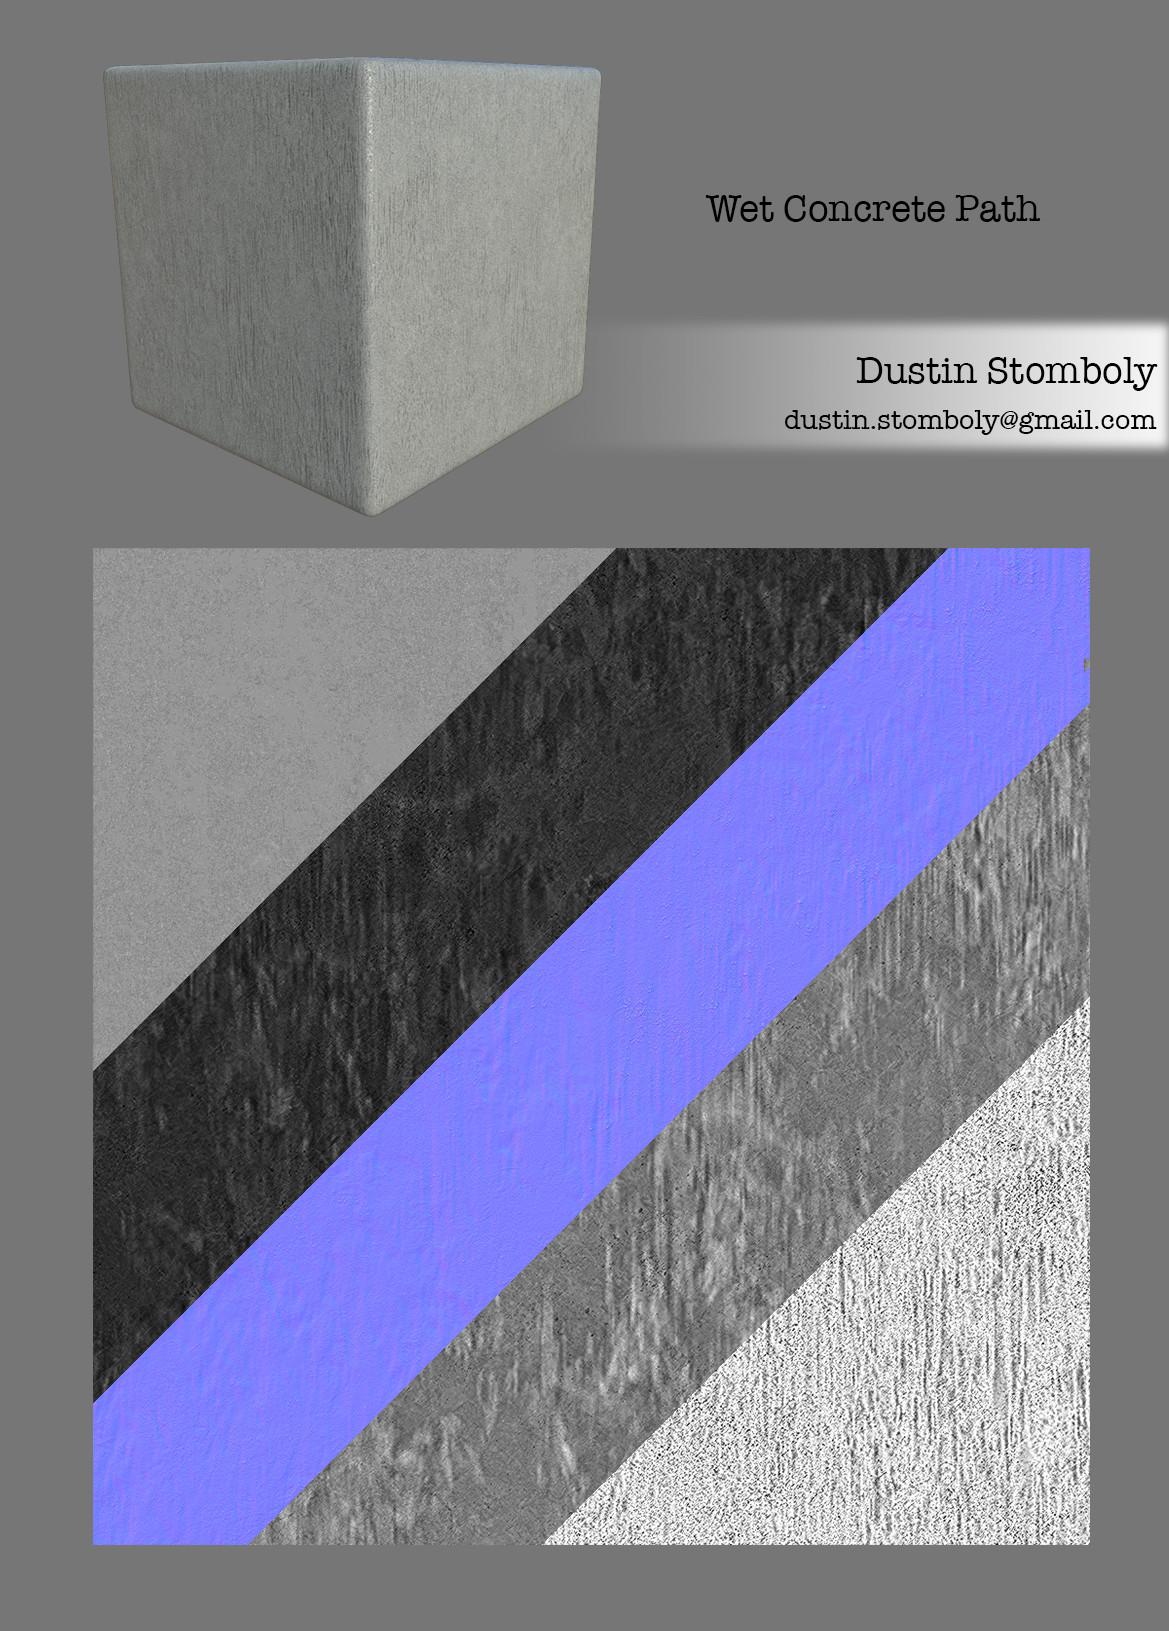 ArtStation - Rainy Courtyard Environment, Dustin Stomboly